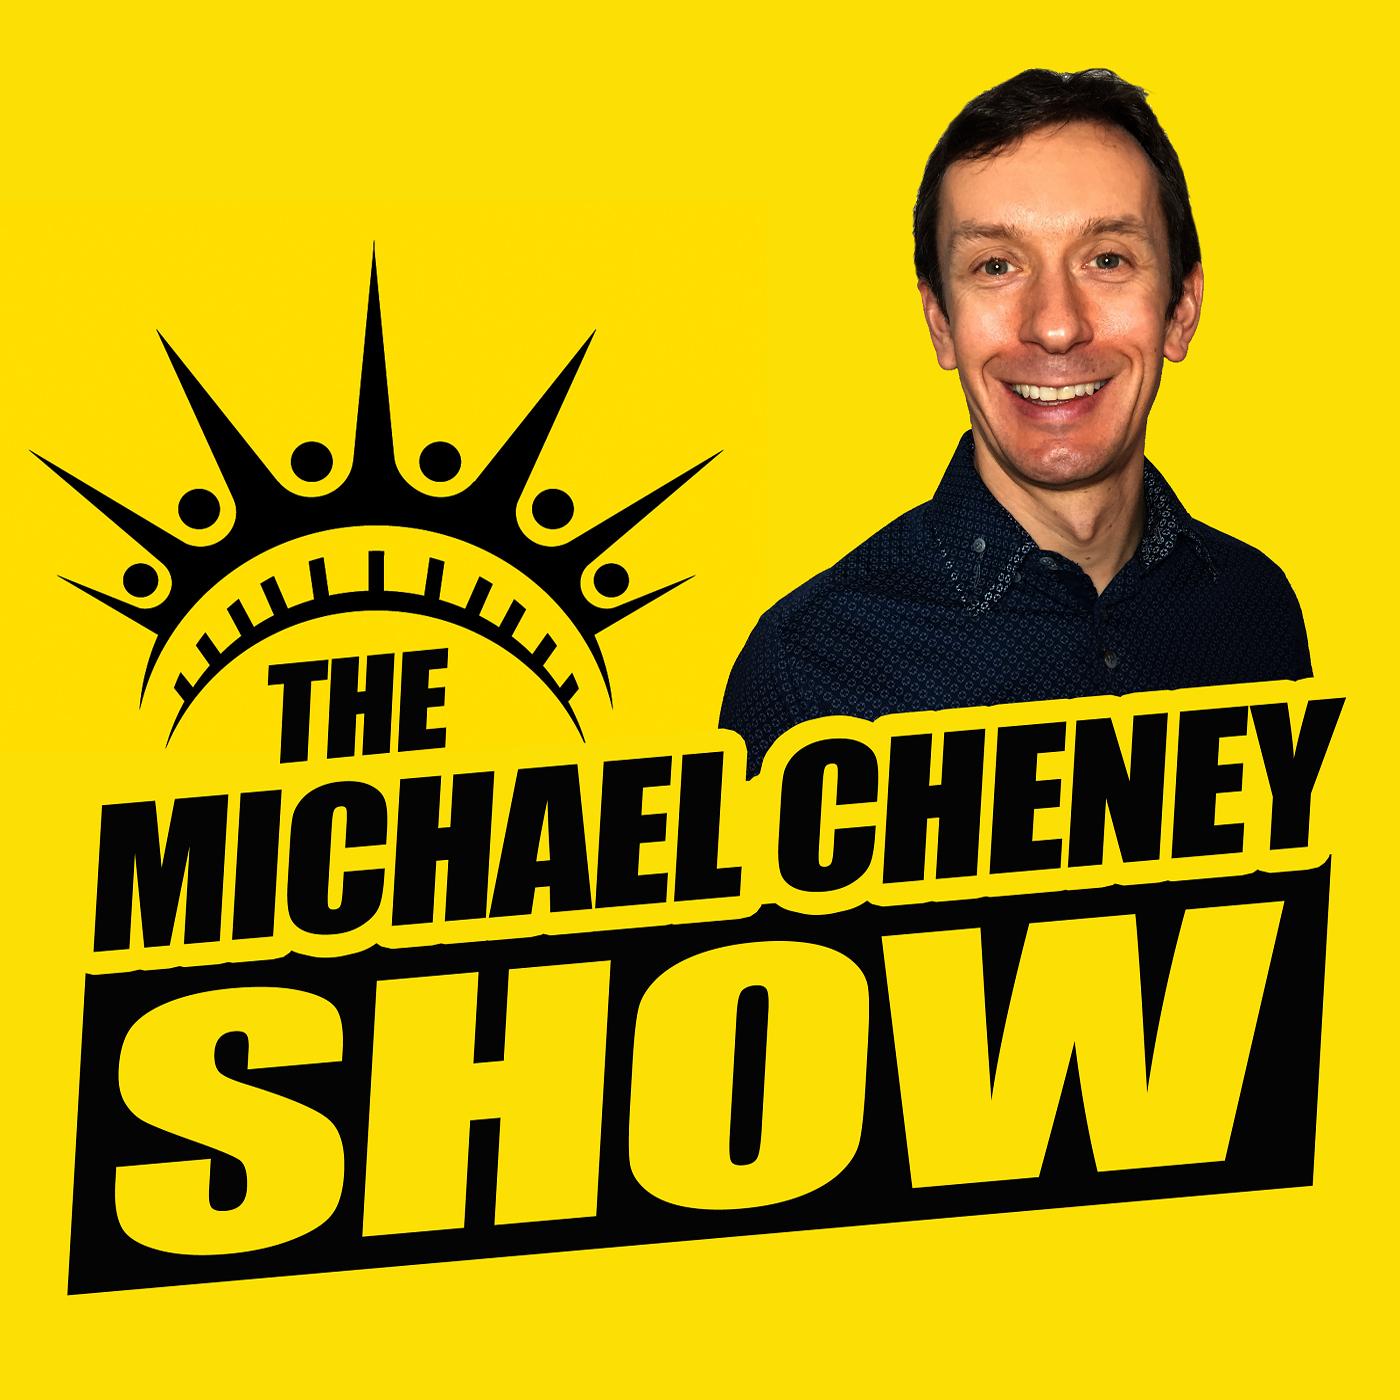 The Michael Cheney Show show art